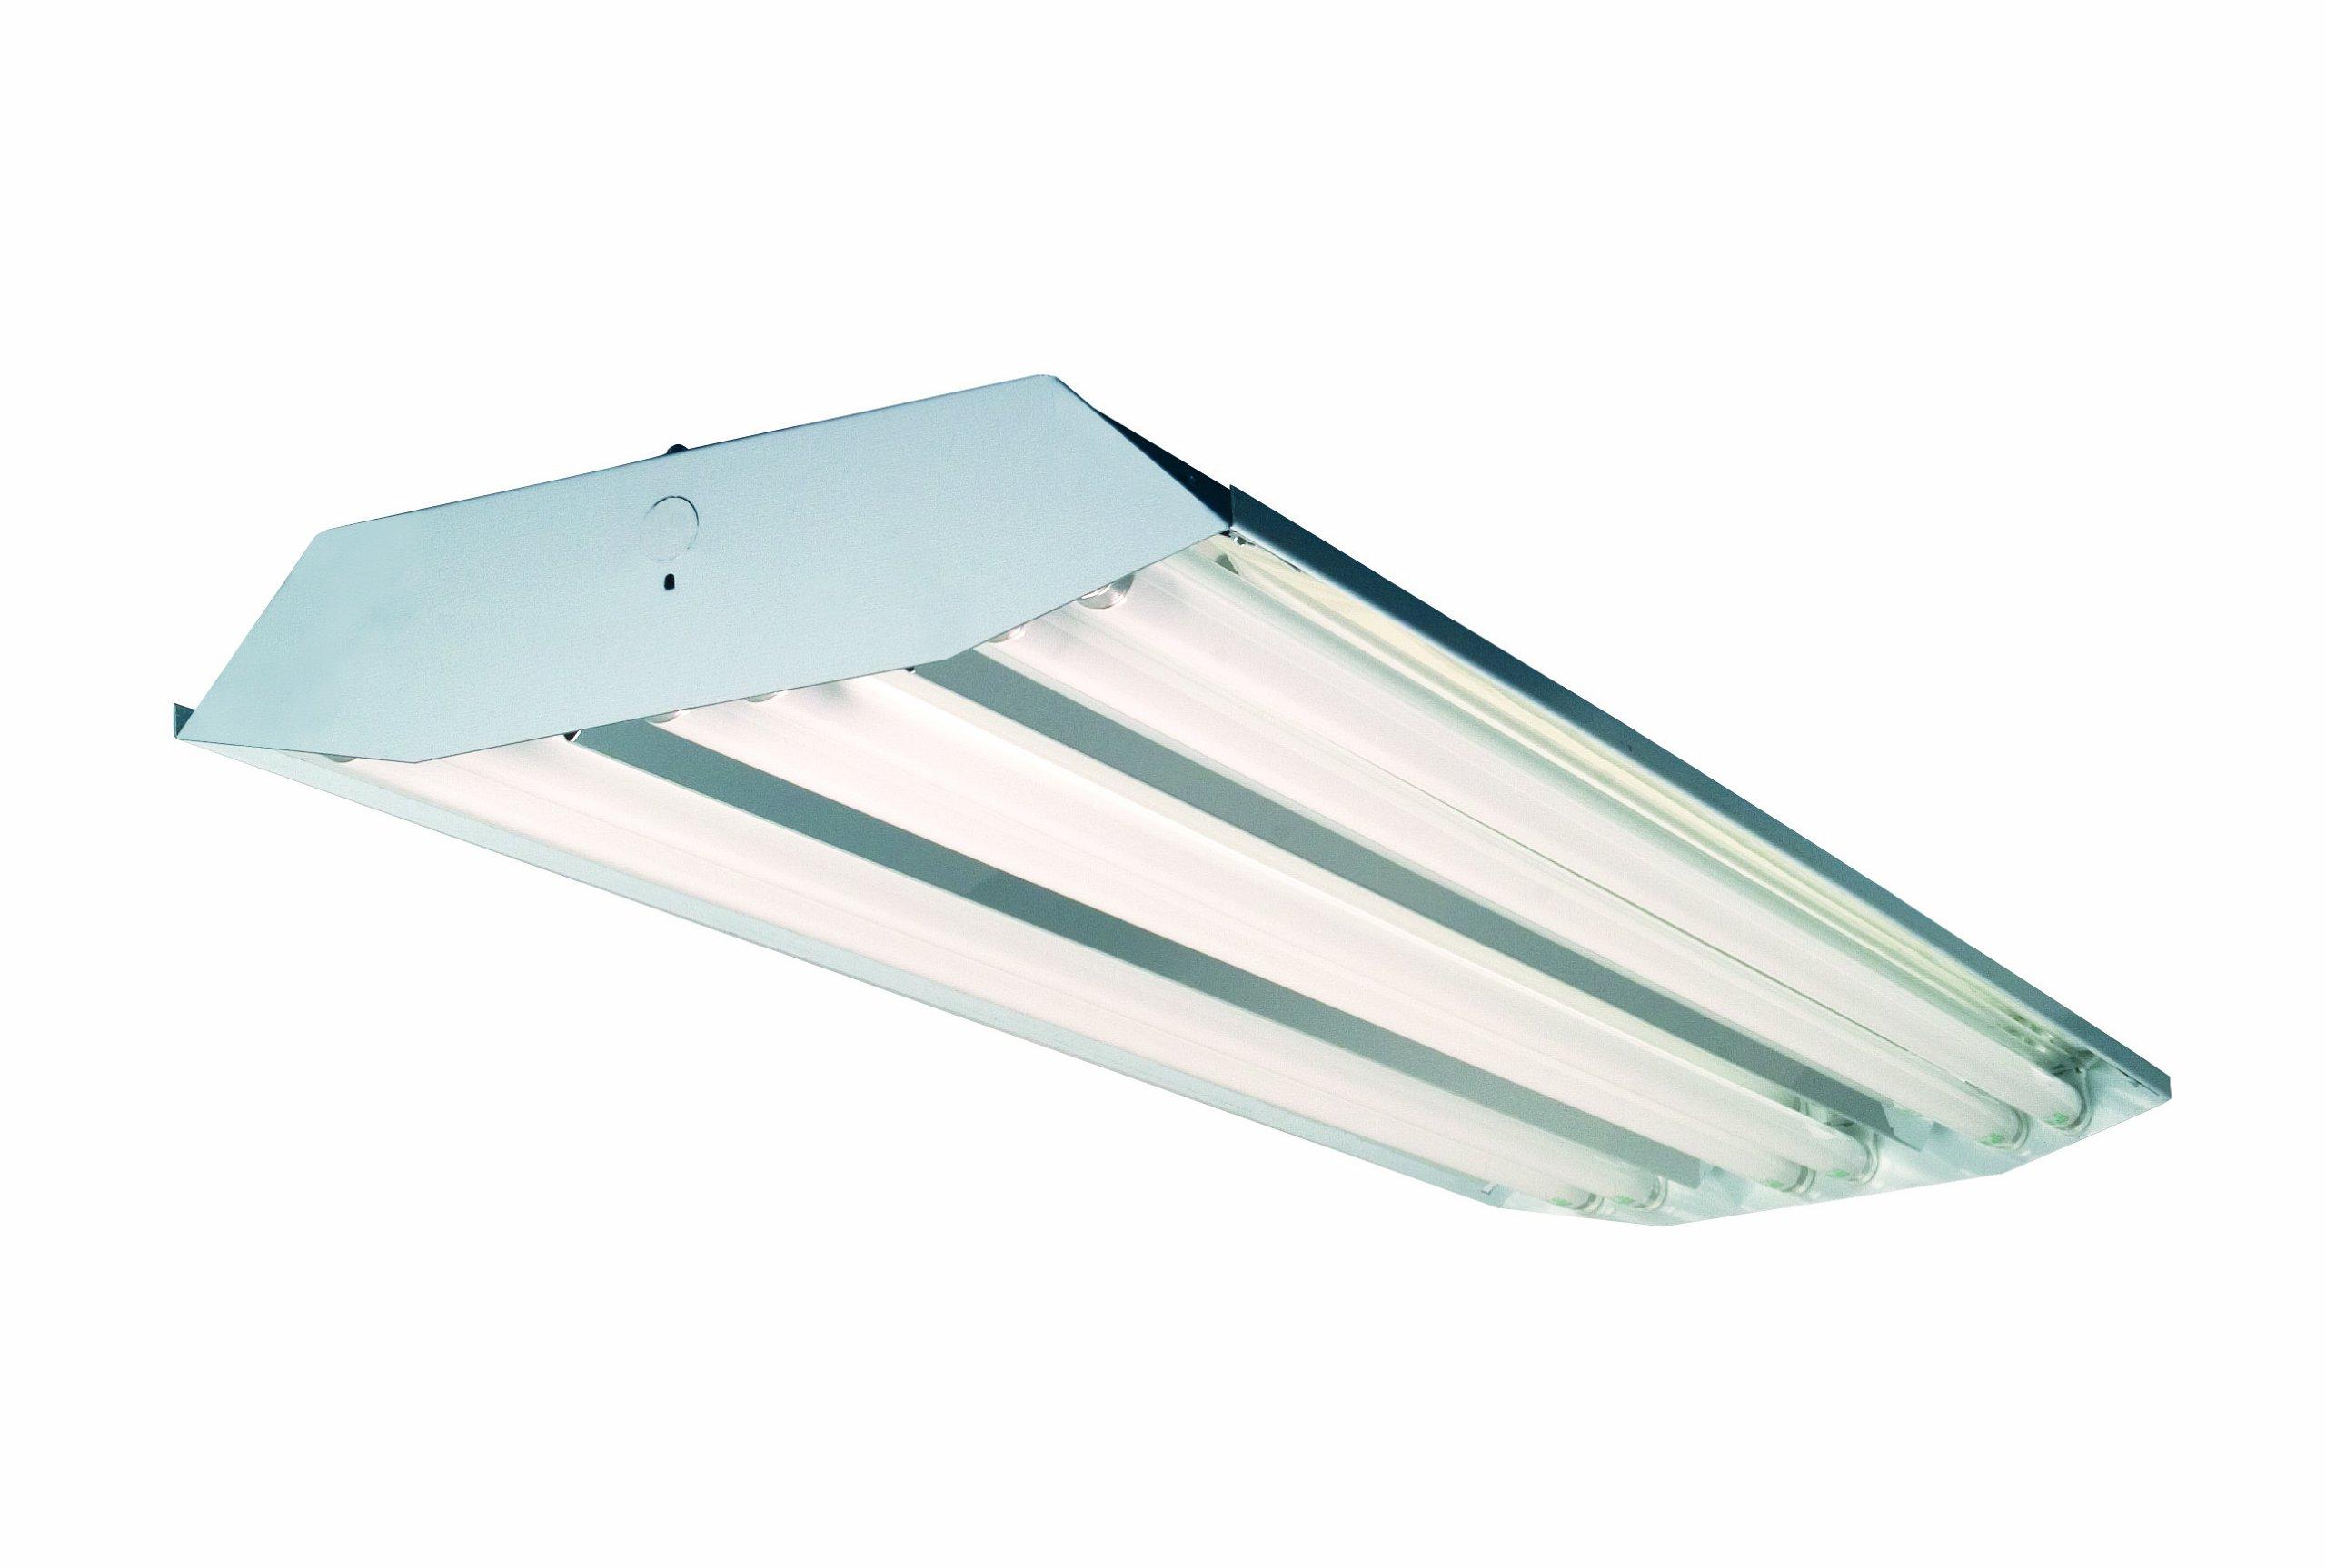 Howard Lighting HFA3E632NHEMV000000I  6 Lamp High Bay Fluorescent  Enhanced Specular Aluminum Reflector